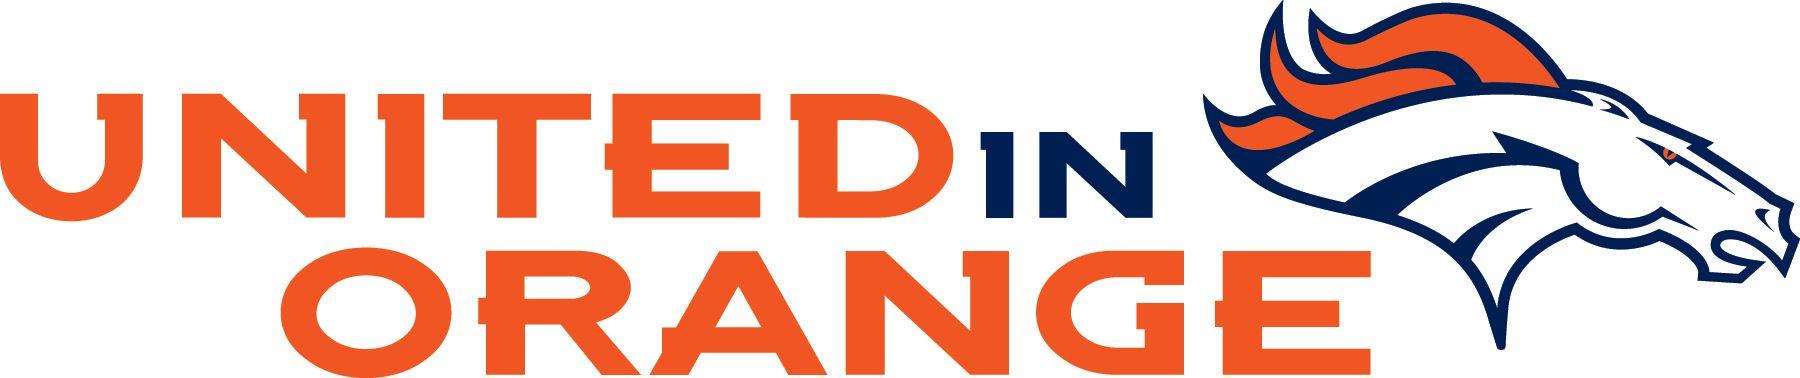 United In Orange. Go Broncos! Take us to the Super Bowl